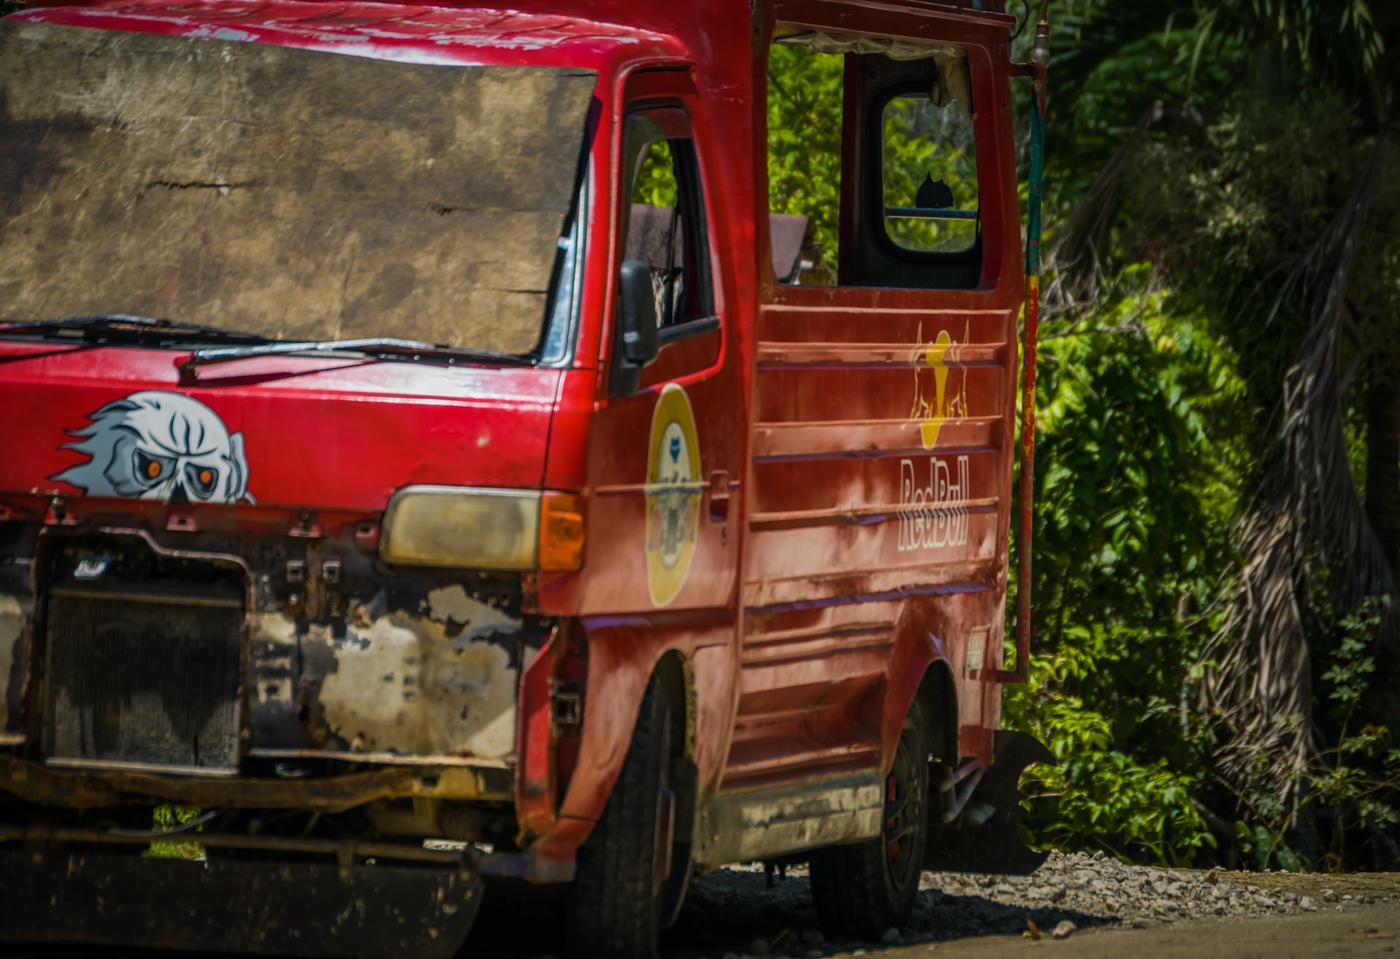 Redbull truck Srargao Pacifico